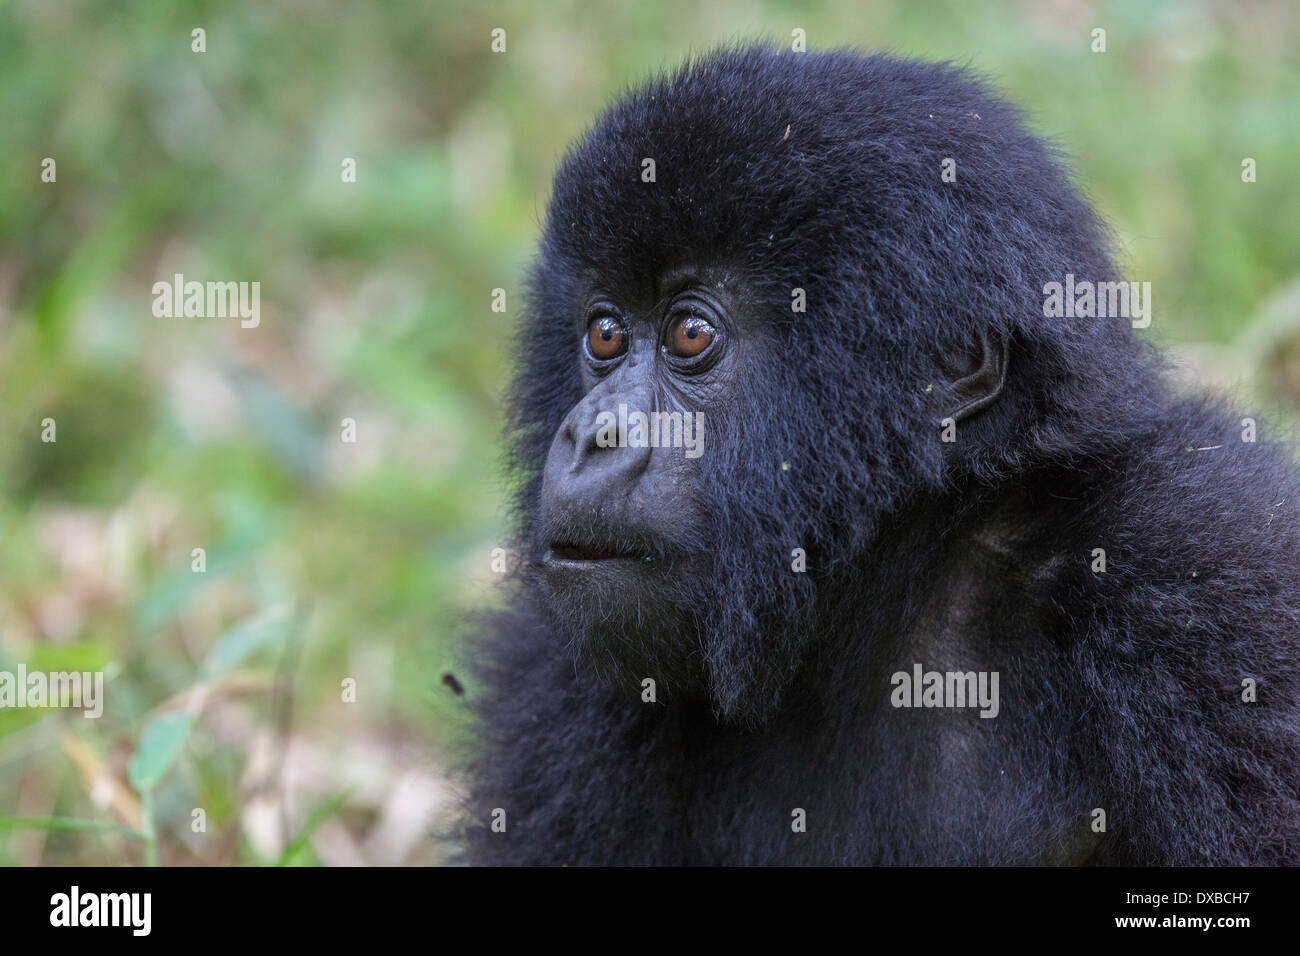 Mountain Gorilla (Gorilla gorilla beringei) side portrait of juvenile's face, Parc National des Volcans, Rwanda Stock Photo